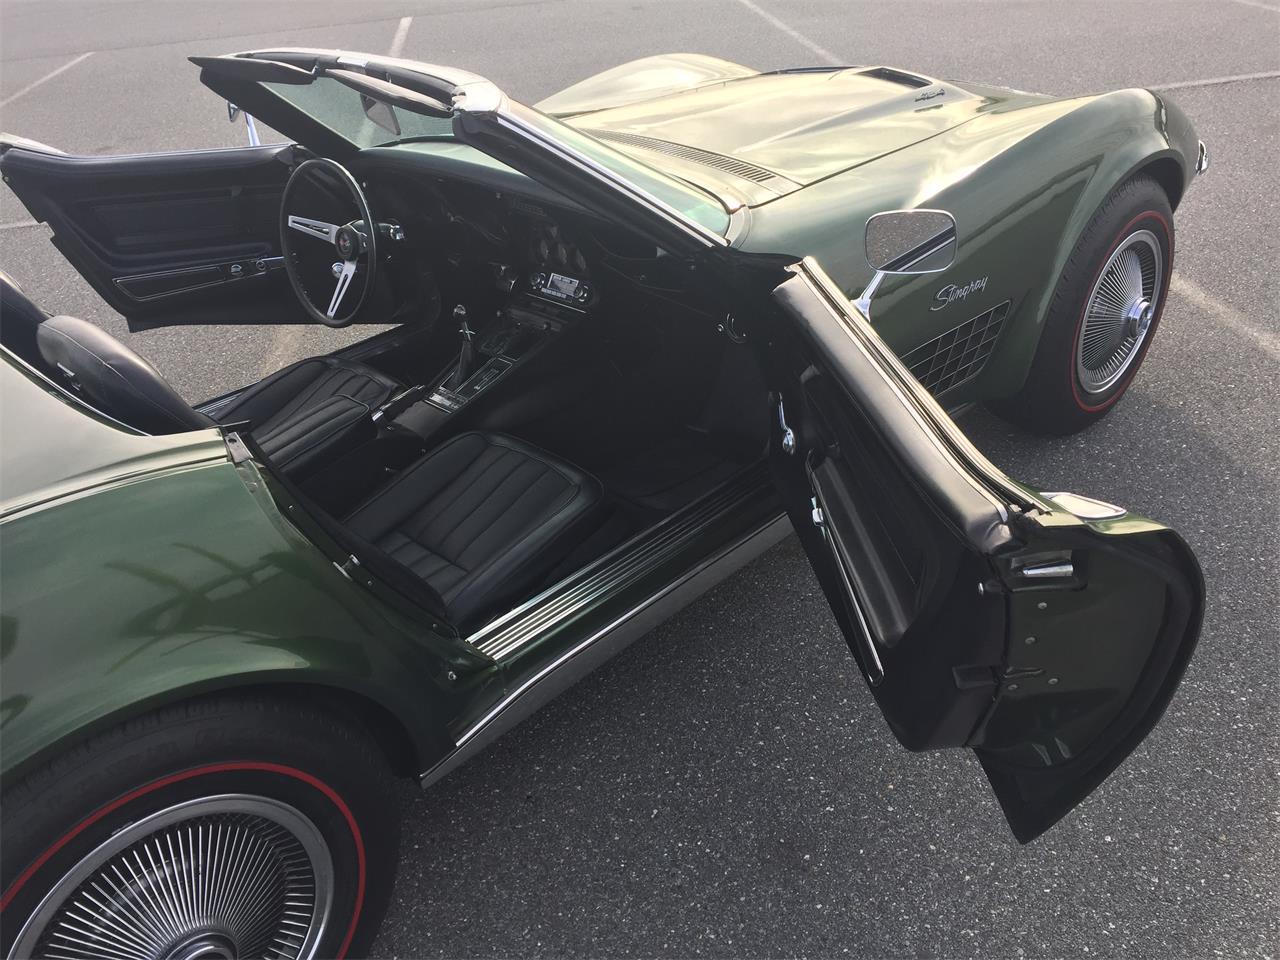 1970 Chevrolet Corvette Stingray (CC-1336712) for sale in Millsboro, Delaware